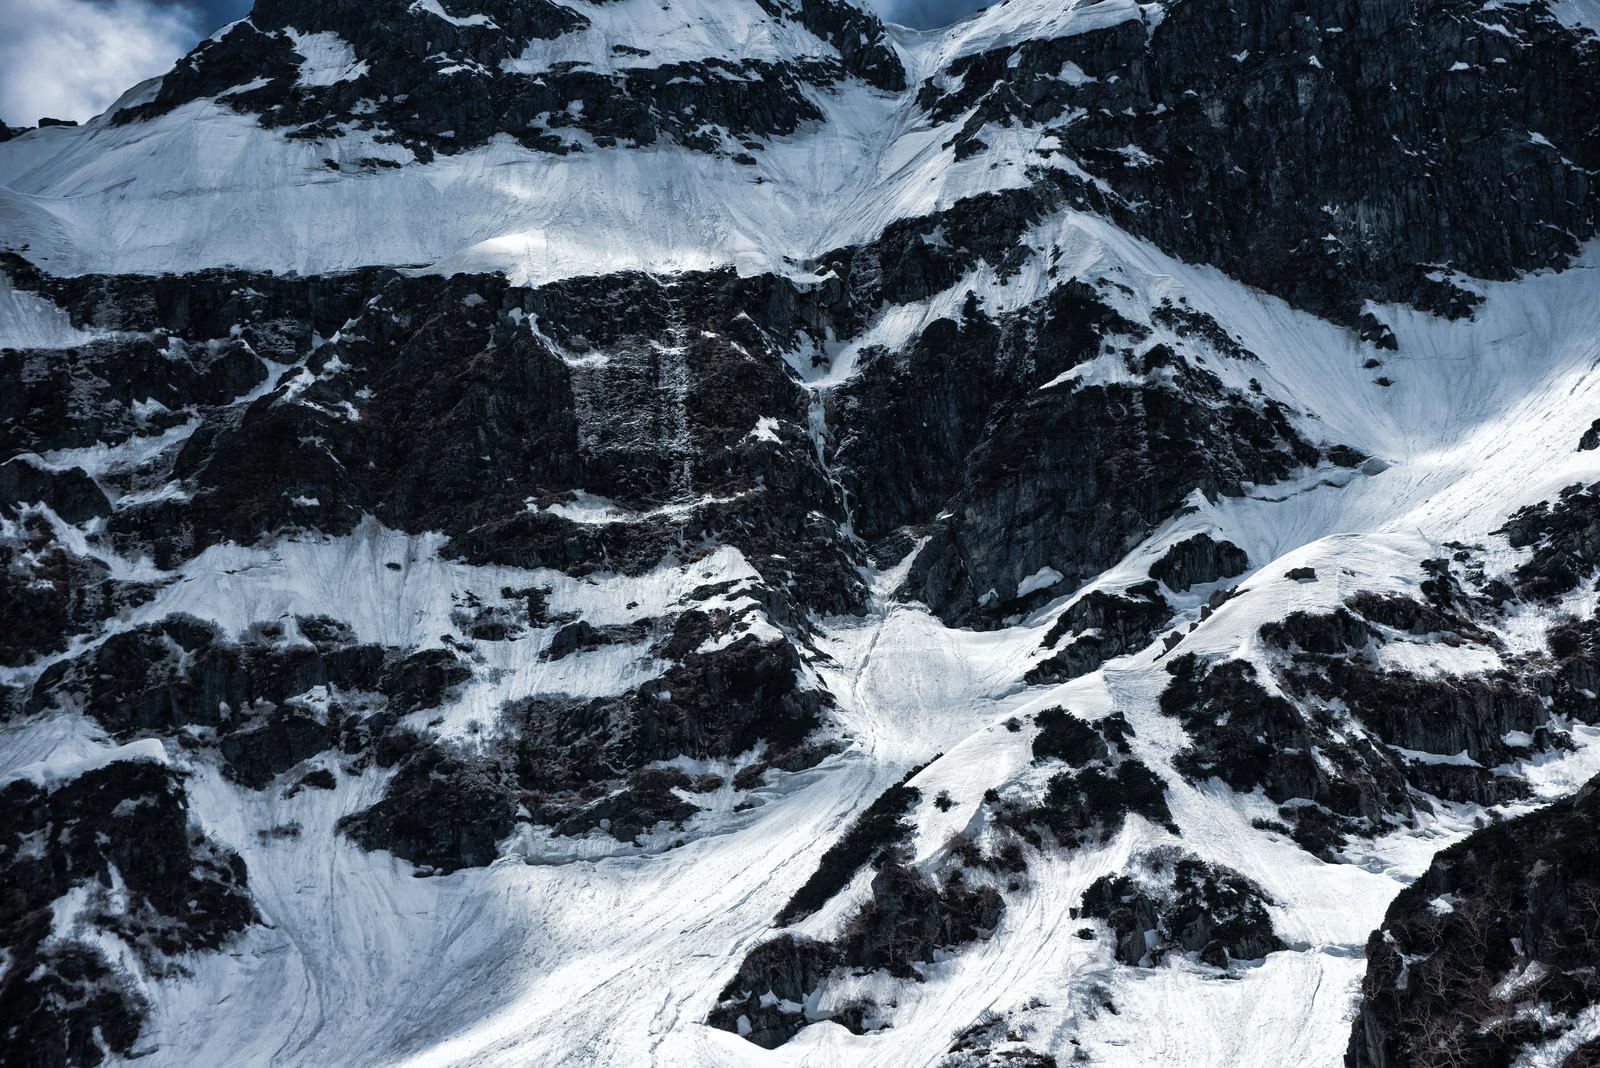 「雪崩発生地帯の岩尾根(奥穂高岳東稜)」の写真